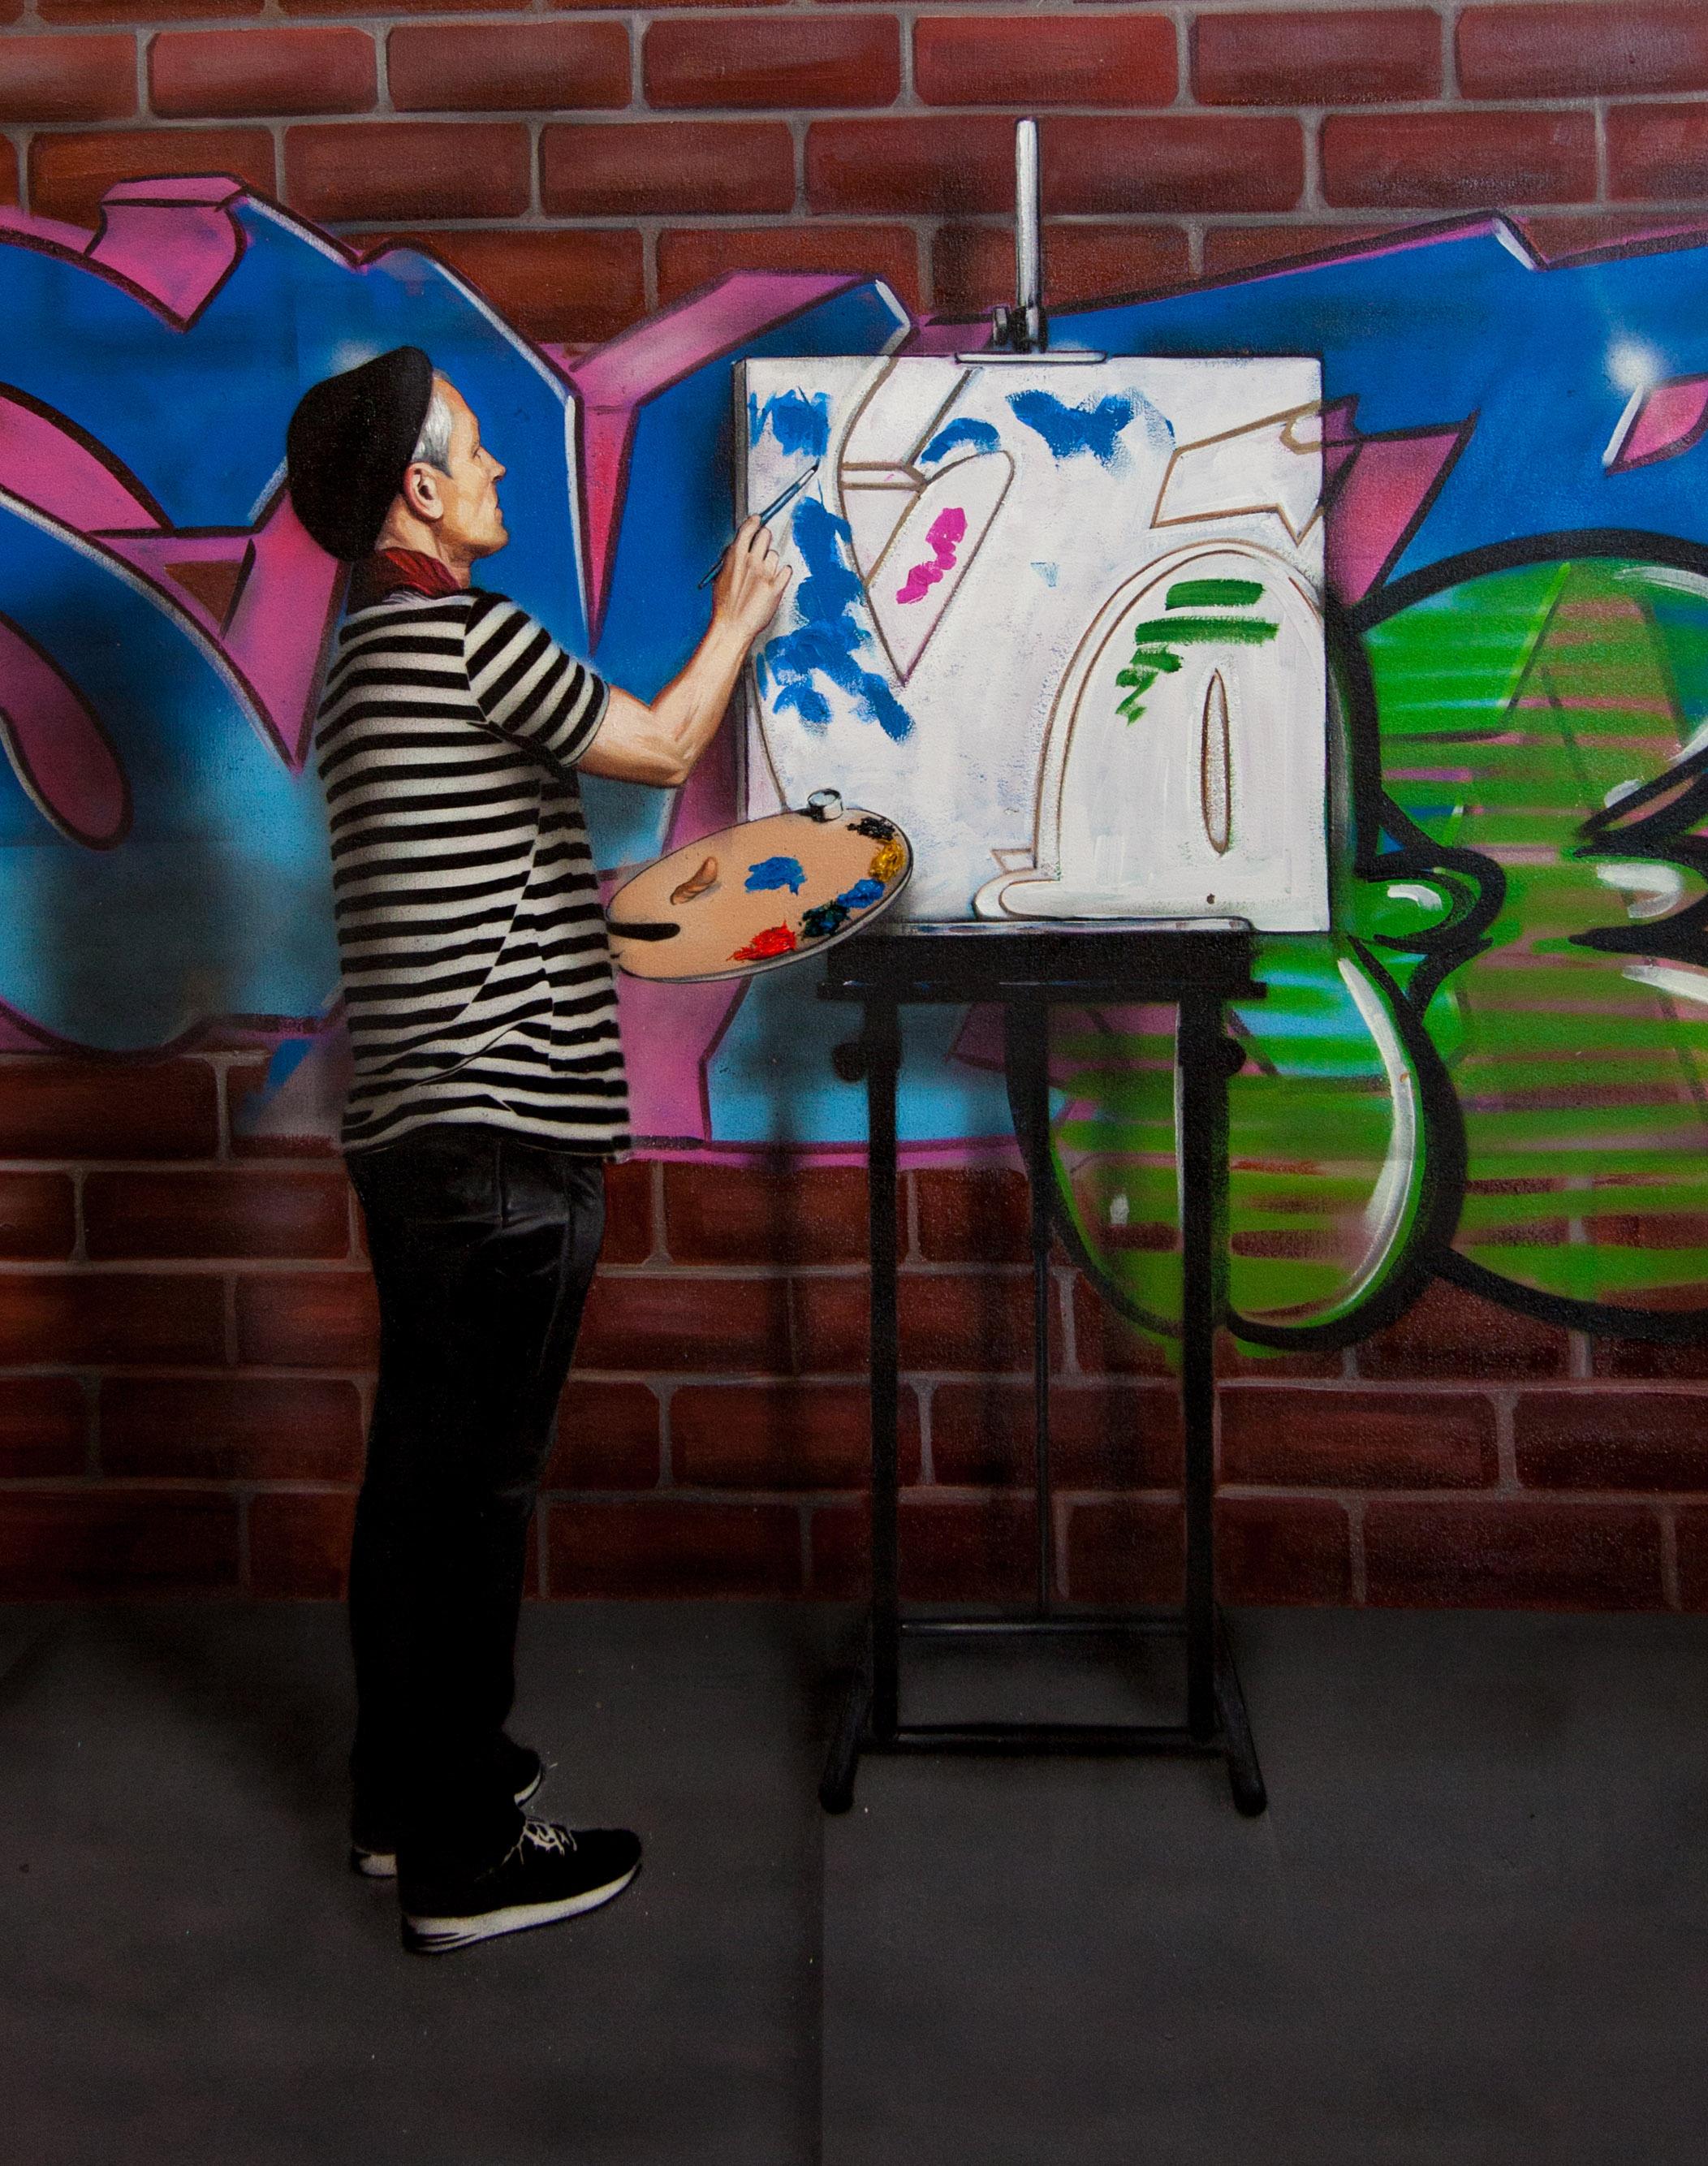 Graffiti by Hijack